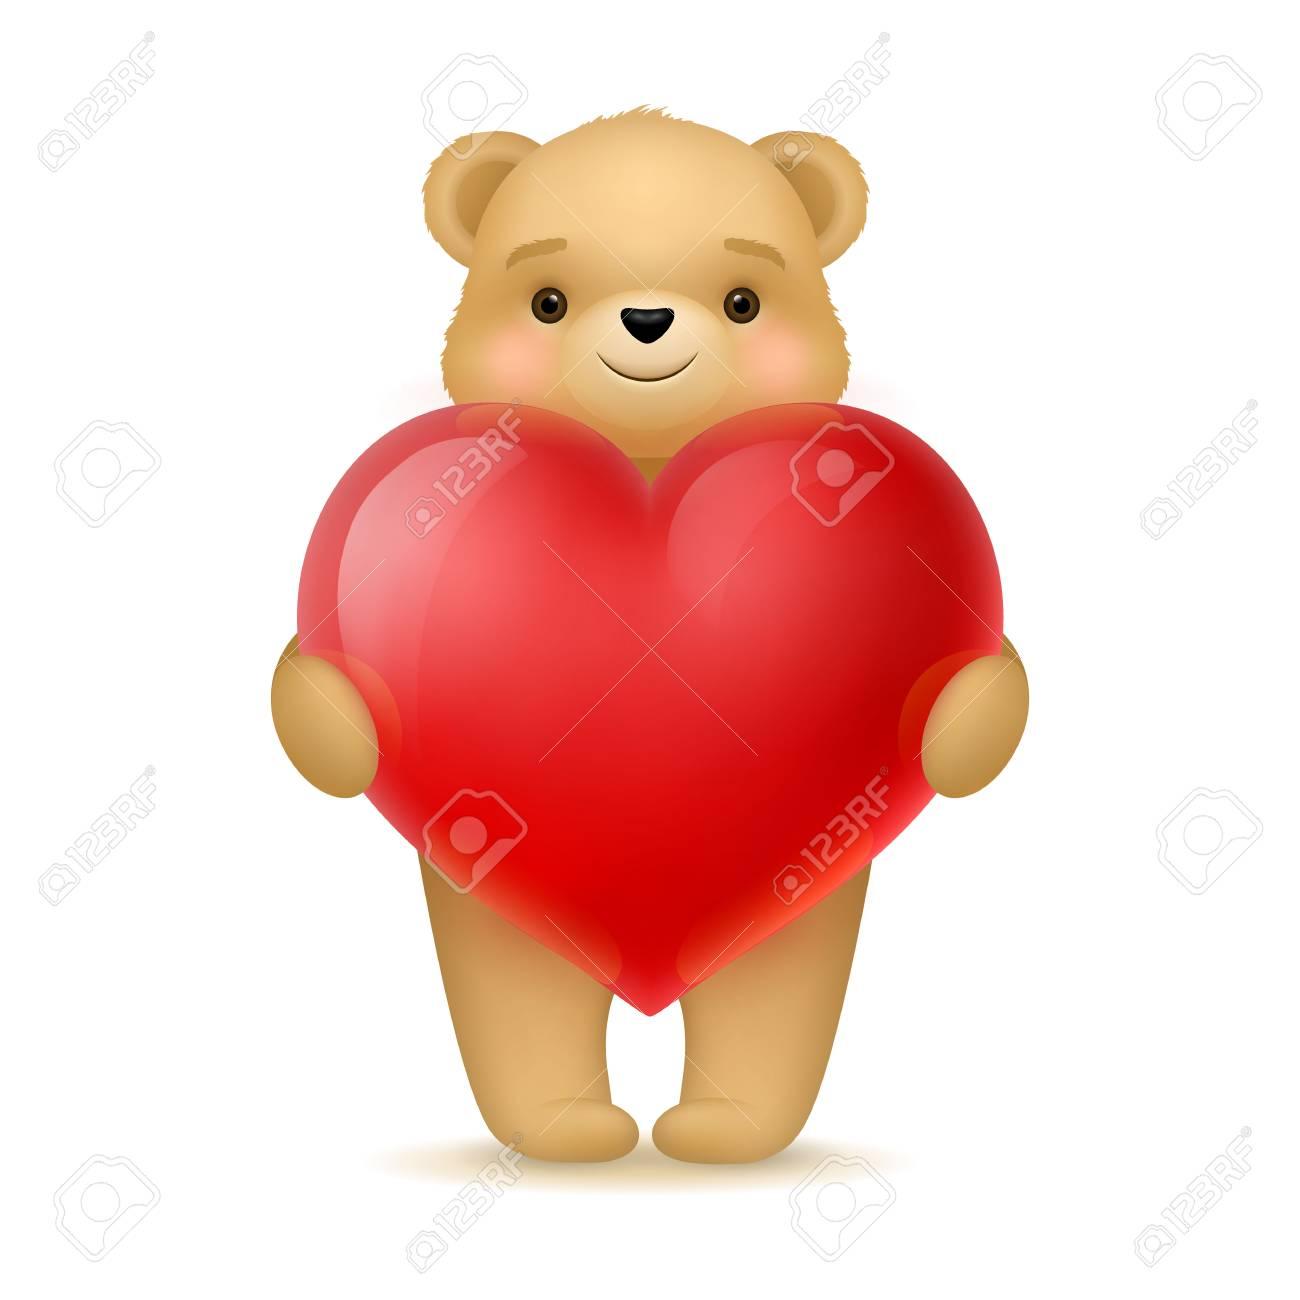 Cute Teddy Bear Holding Big Heart Stock Photo   68460584